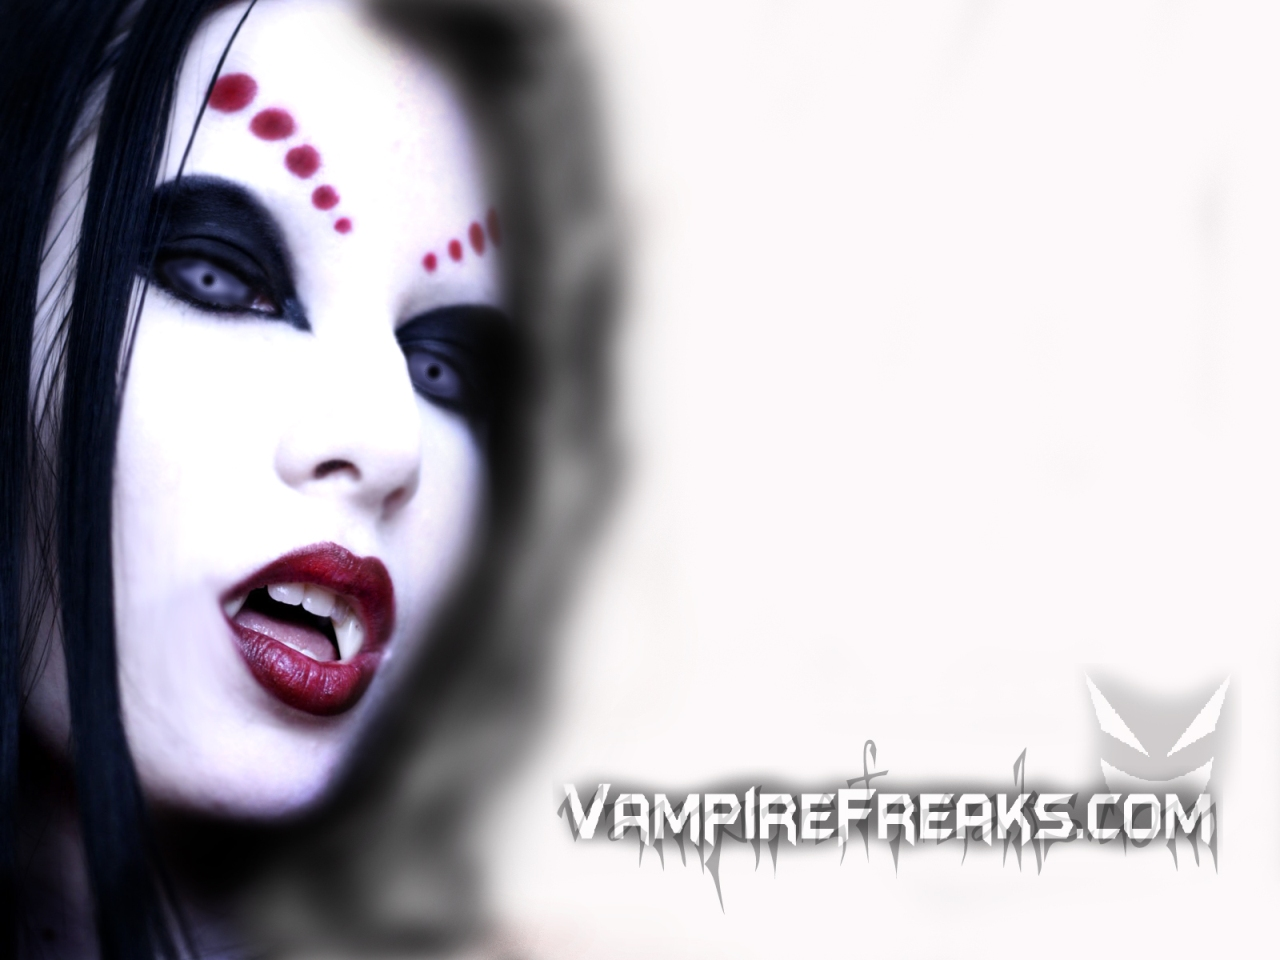 Vampire sex with babes pics cartoon scene